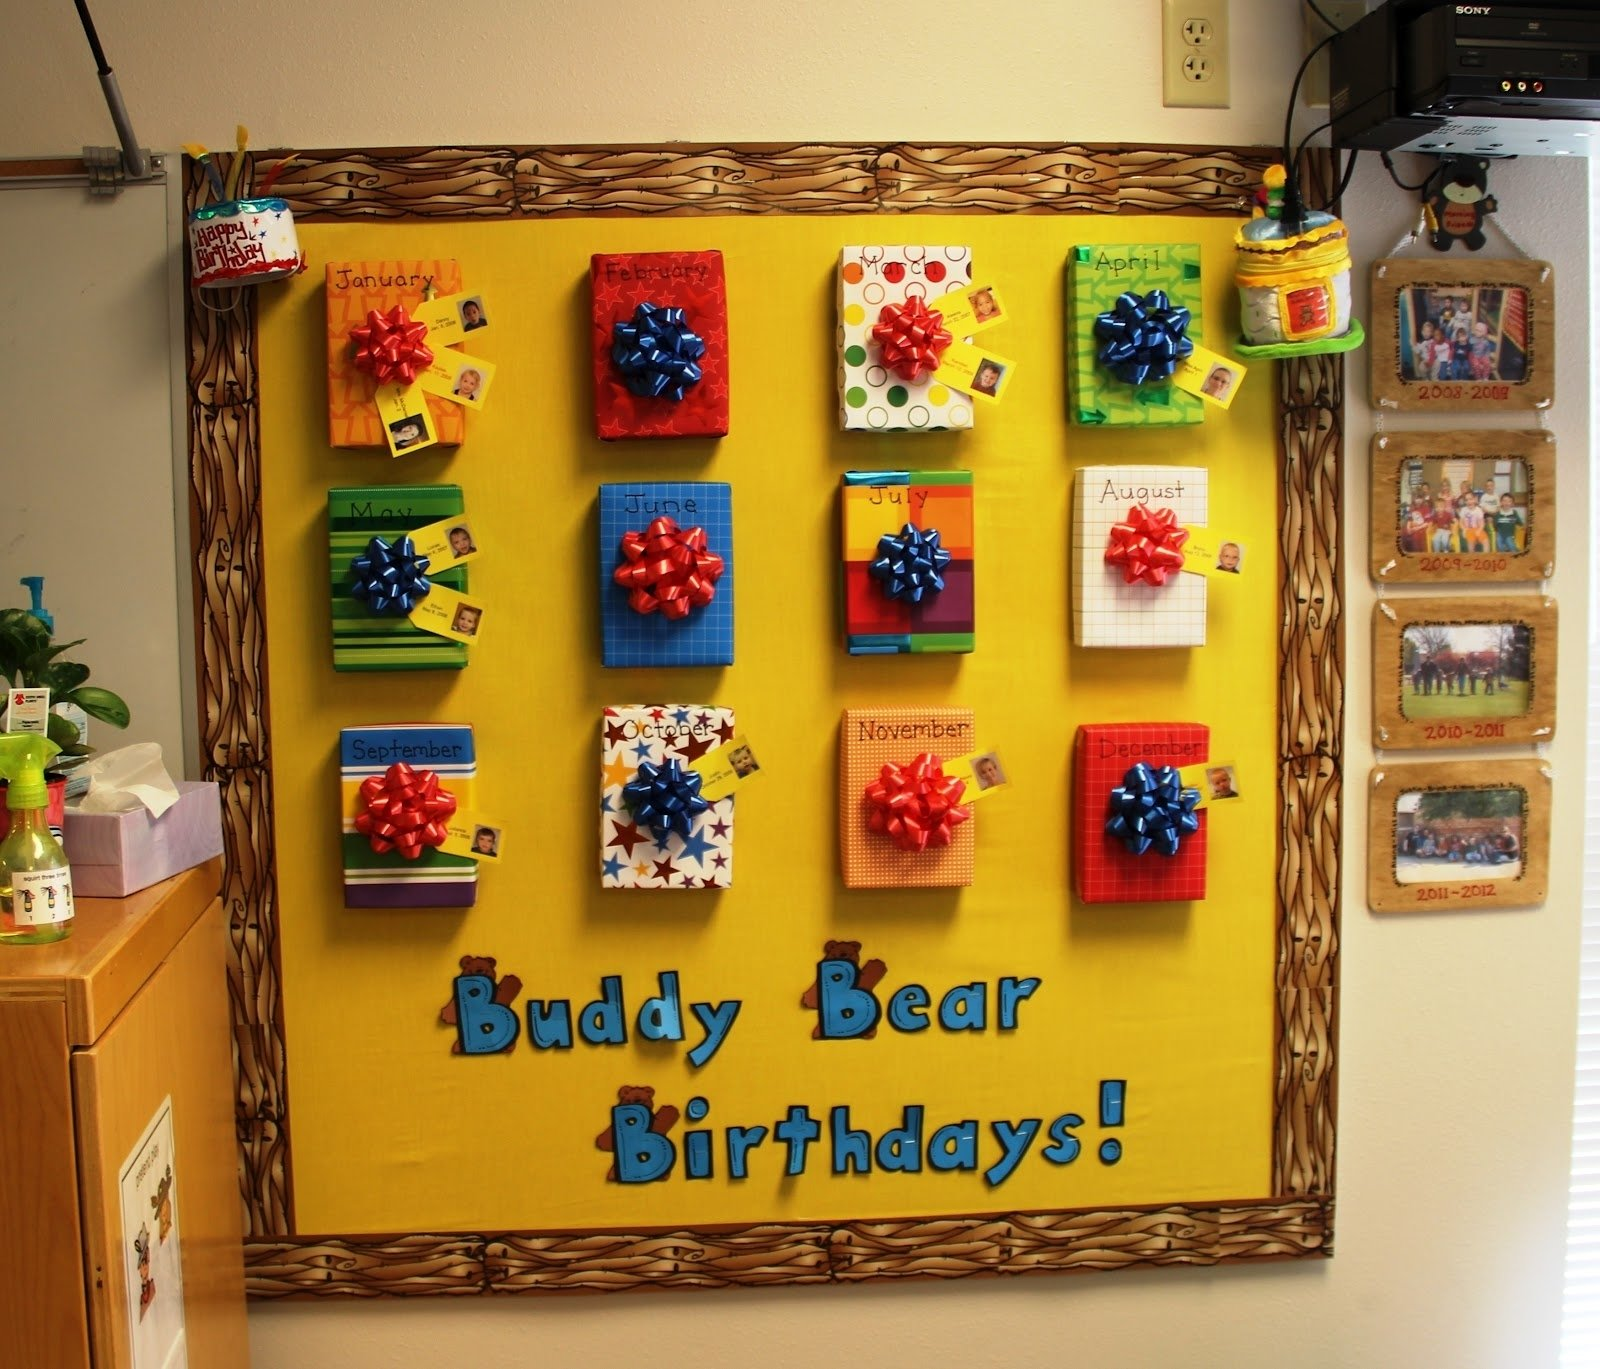 10 Wonderful Happy Birthday Bulletin Board Ideas considerate classroom early childhood special education edition 6 2020